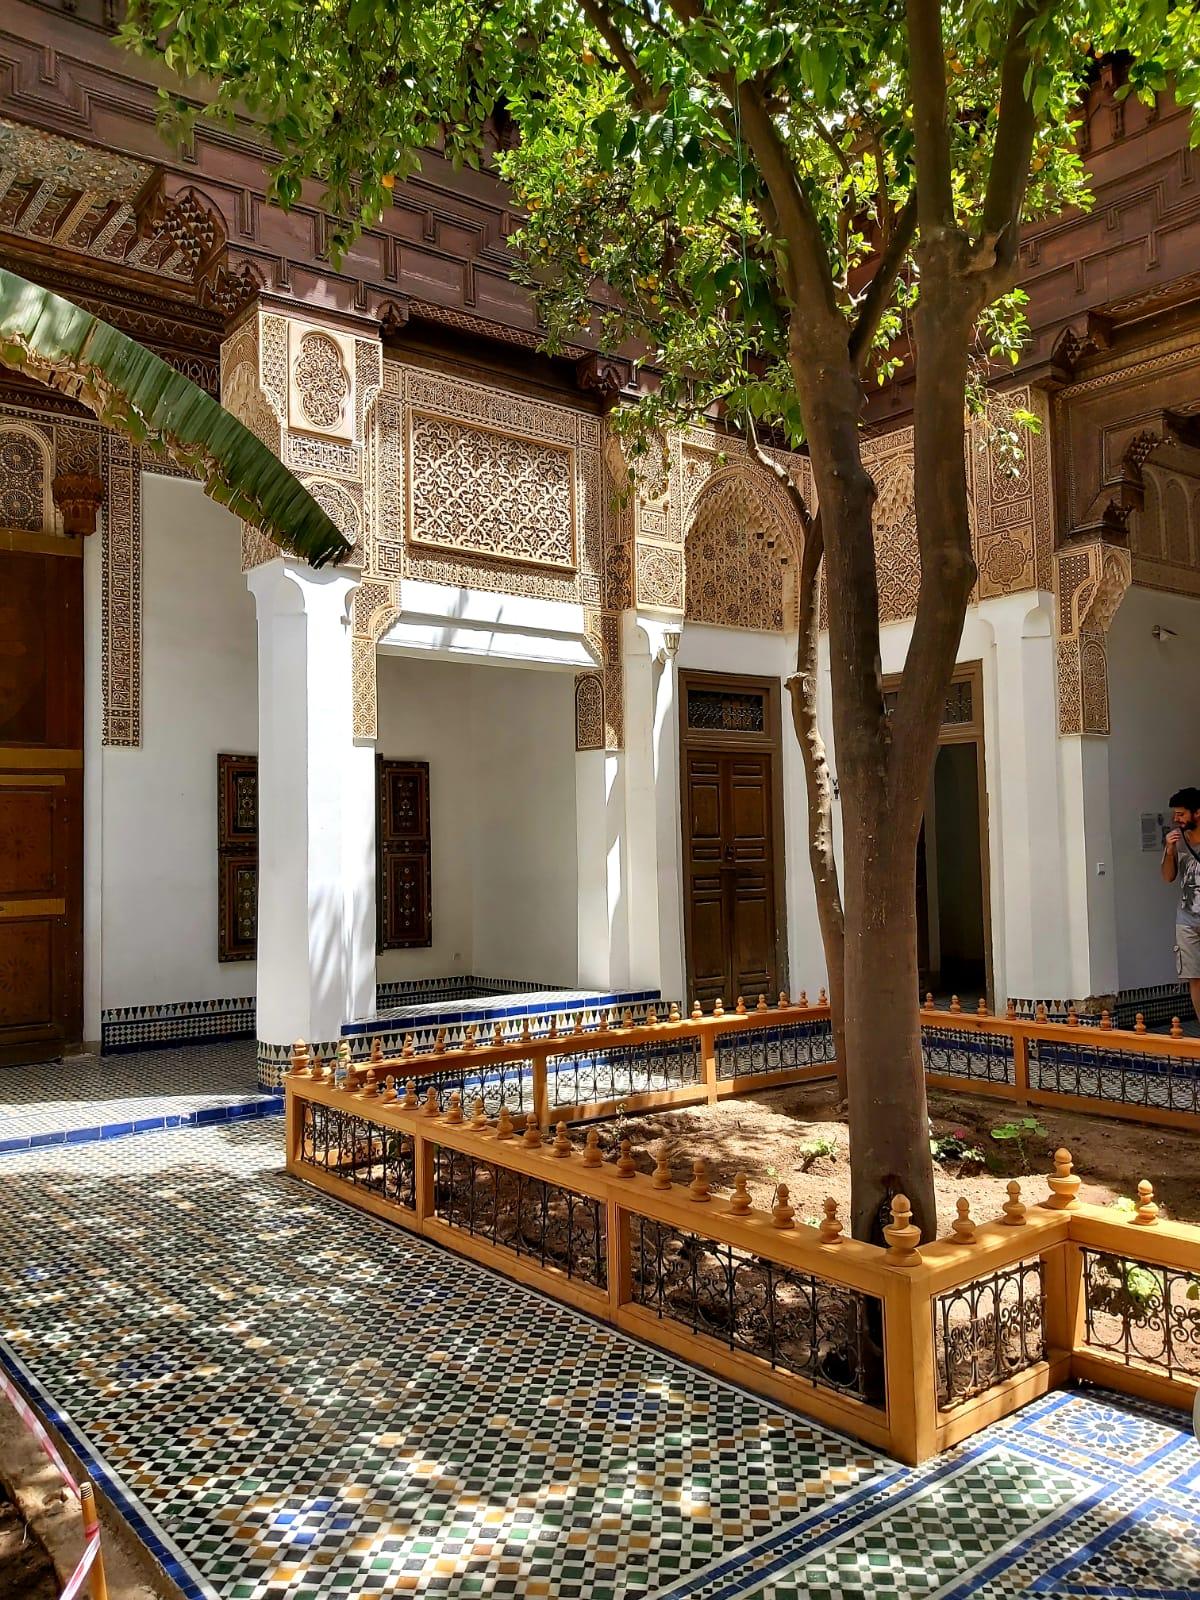 Marrakech met tieners Bahia Palace